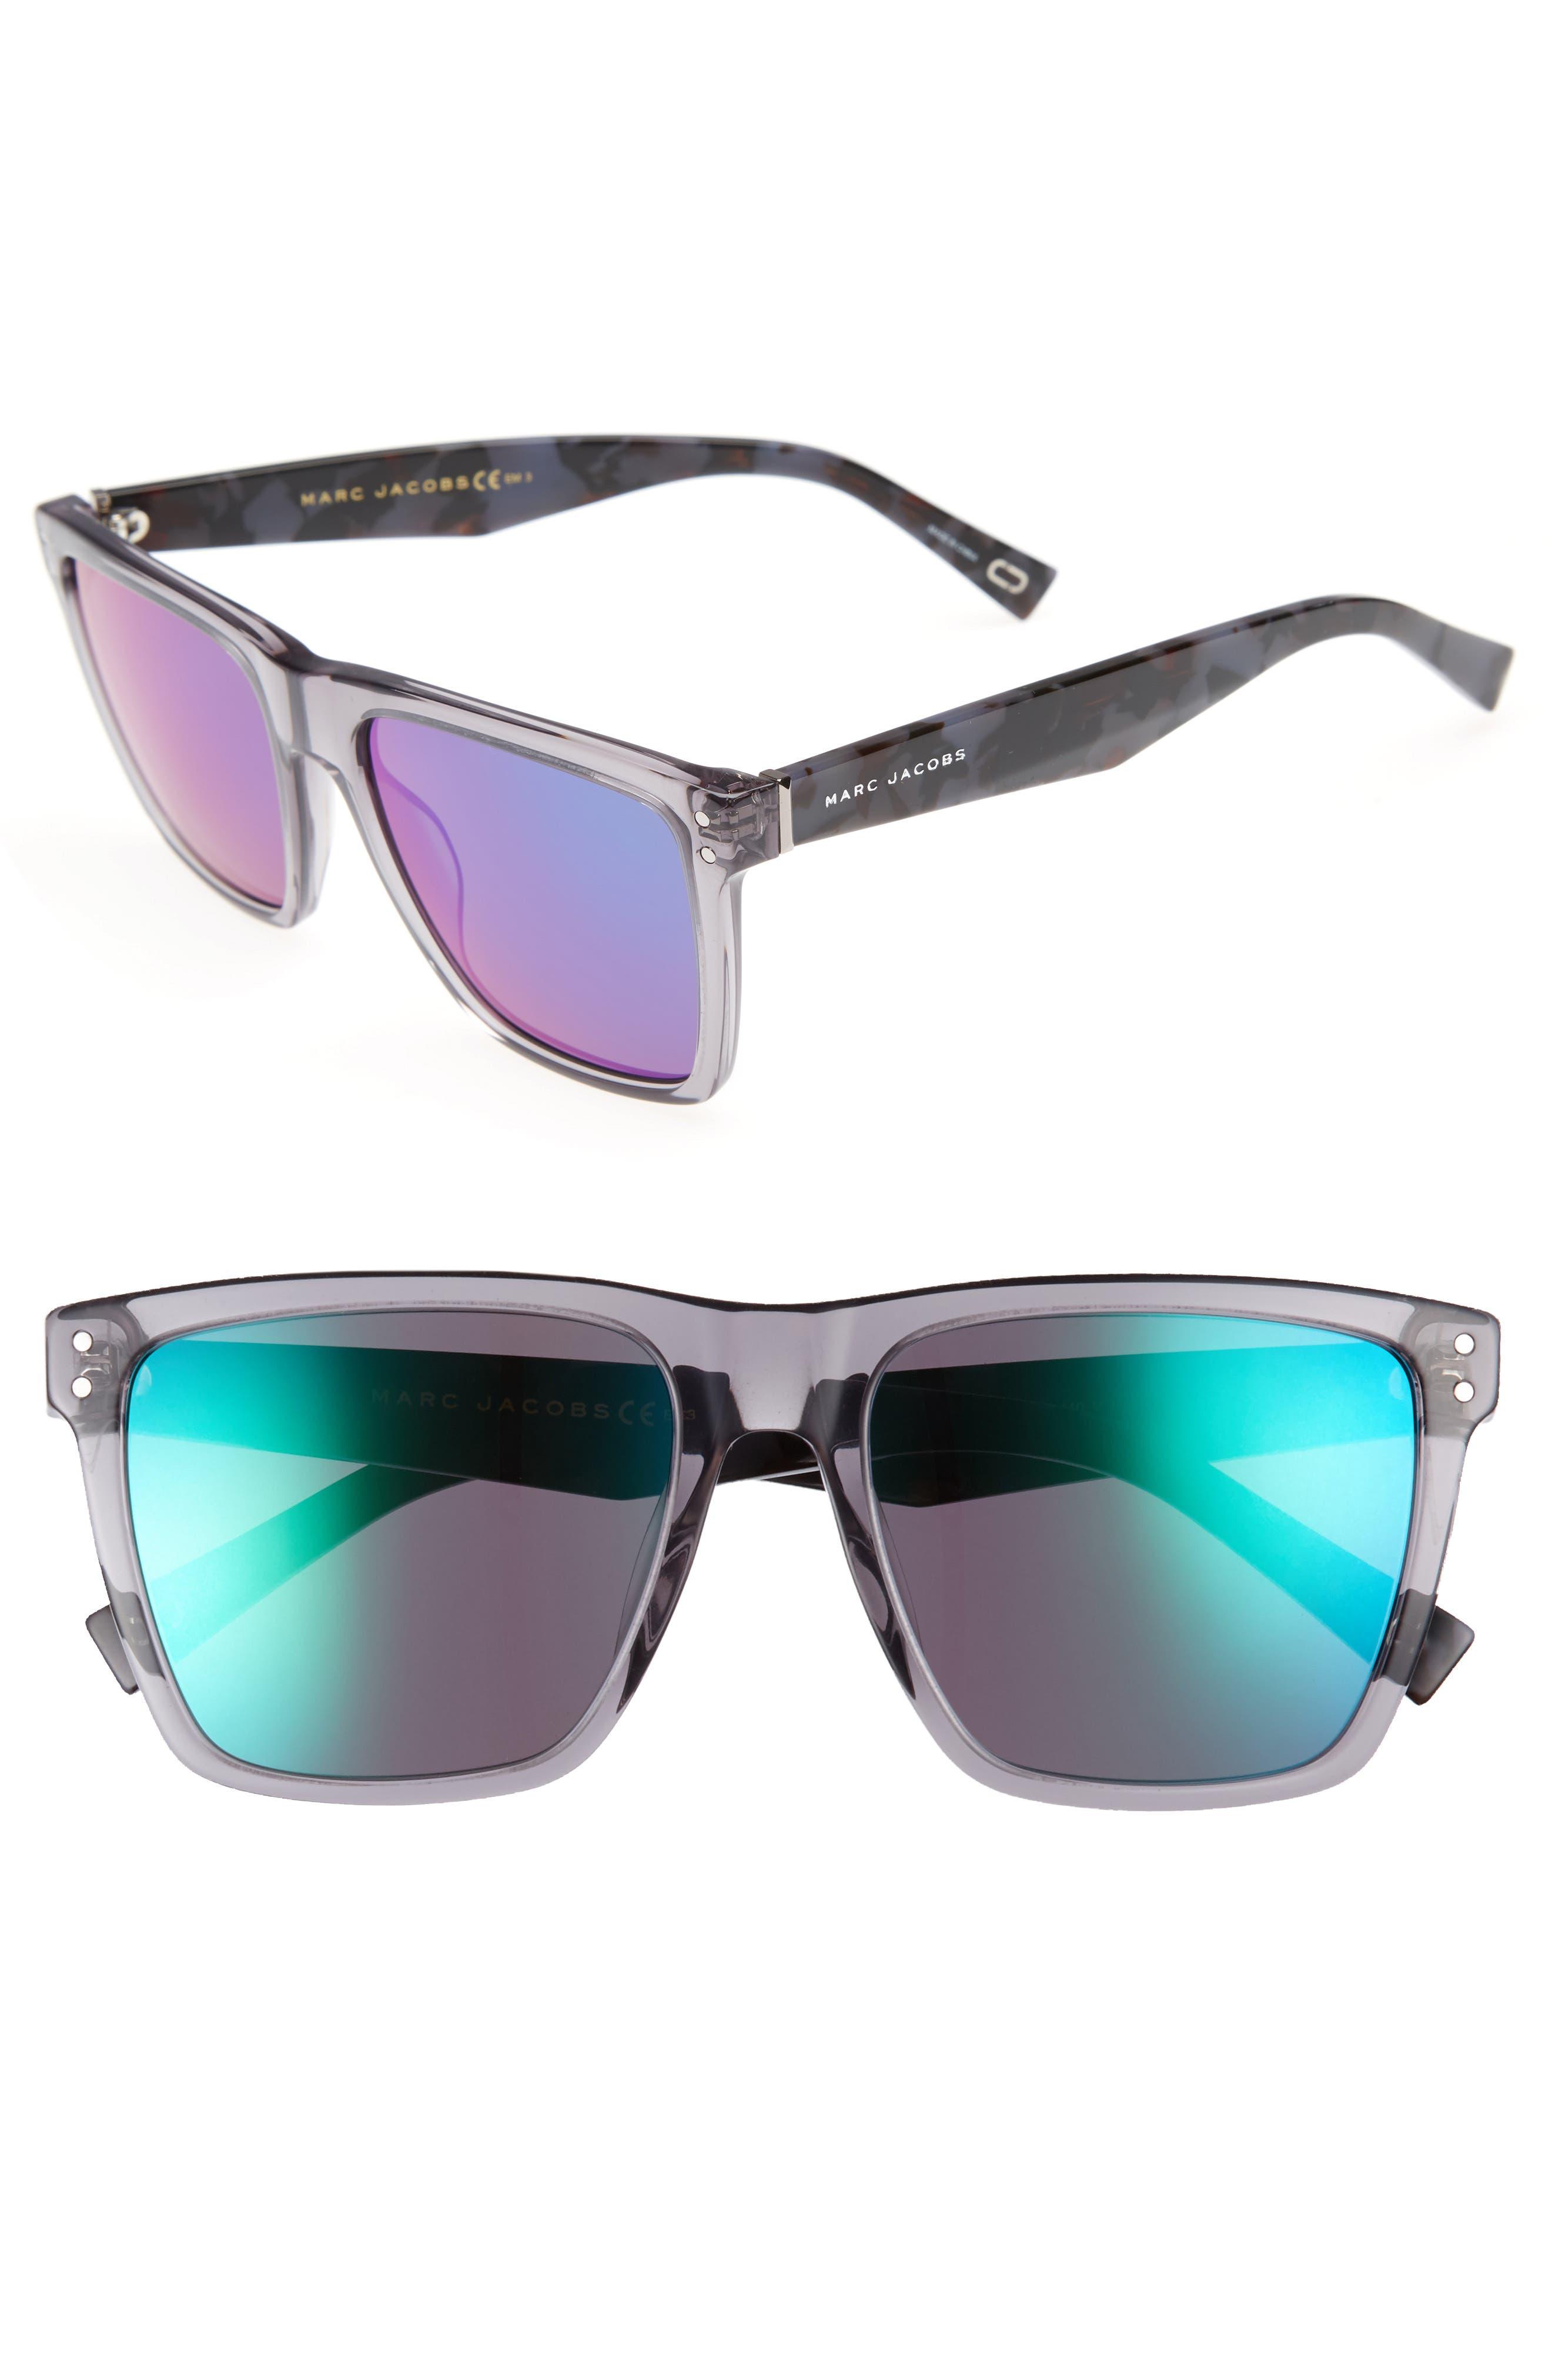 54mm Flat Top Gradient Square Frame Sunglasses,                             Main thumbnail 1, color,                             GREY HAVANA